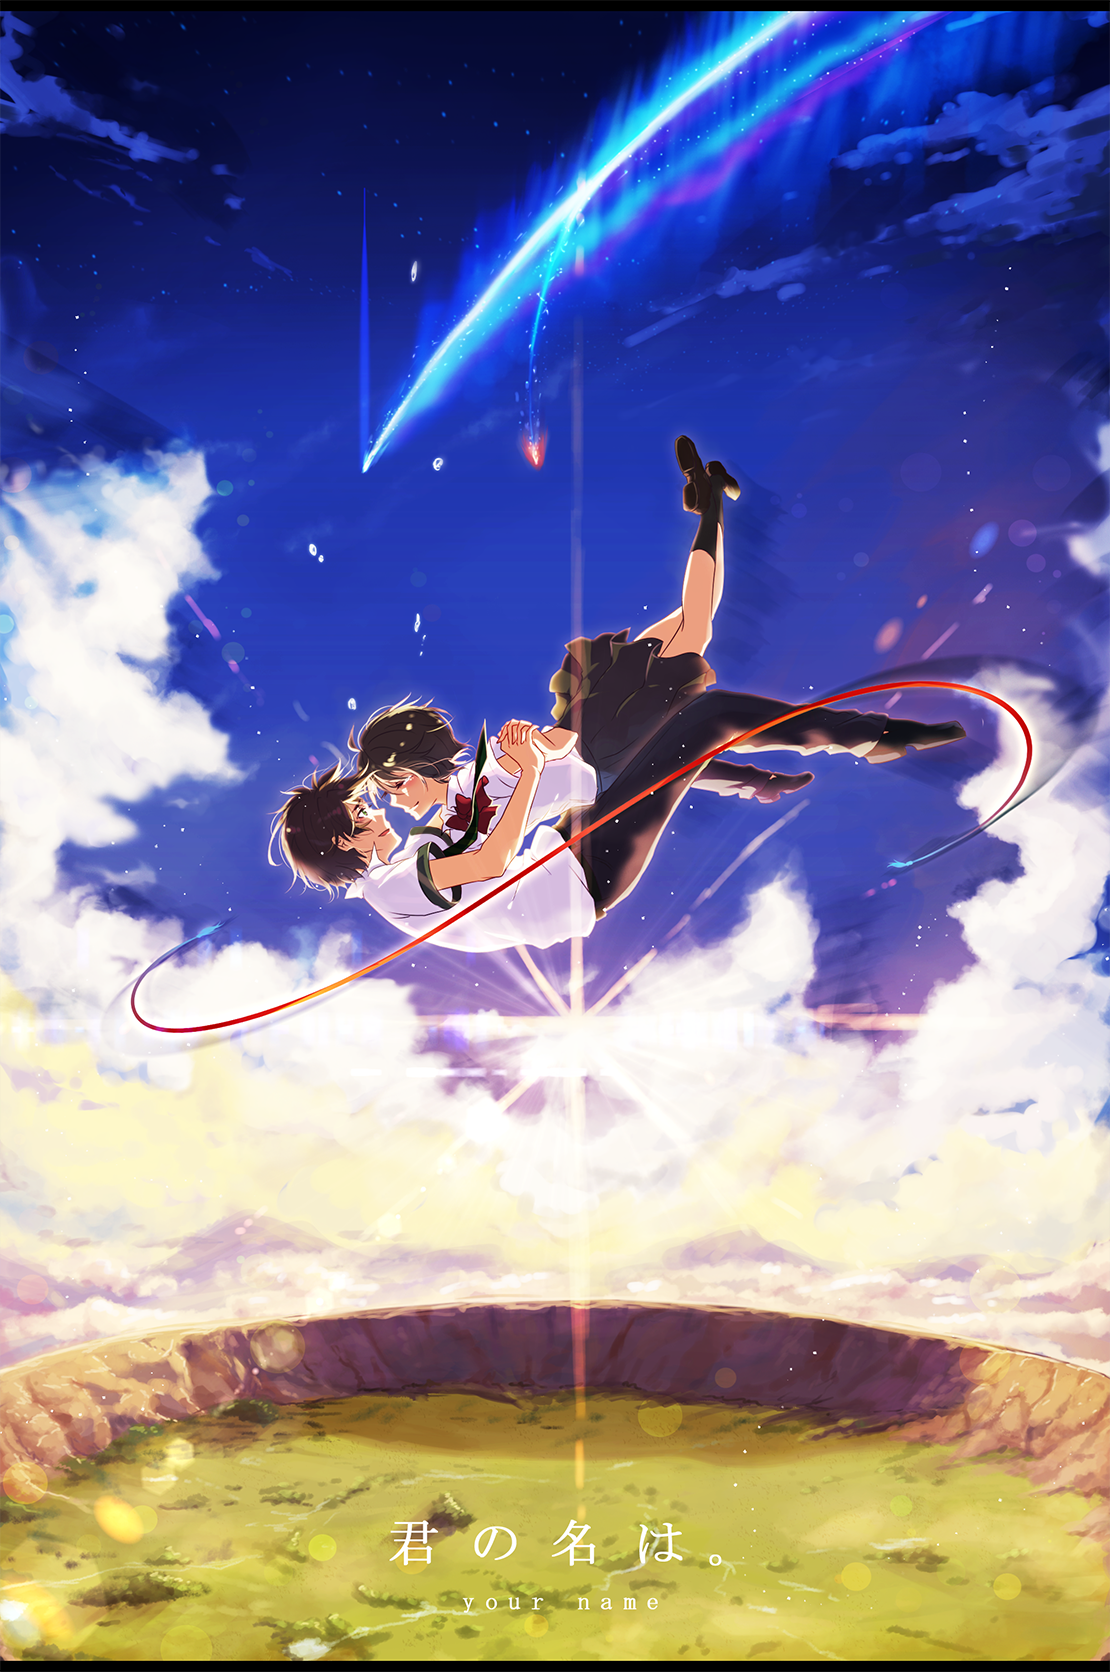 """Miyamizu Mitsuha"" ""Tachibana Taki"" Anime, Hình nền"